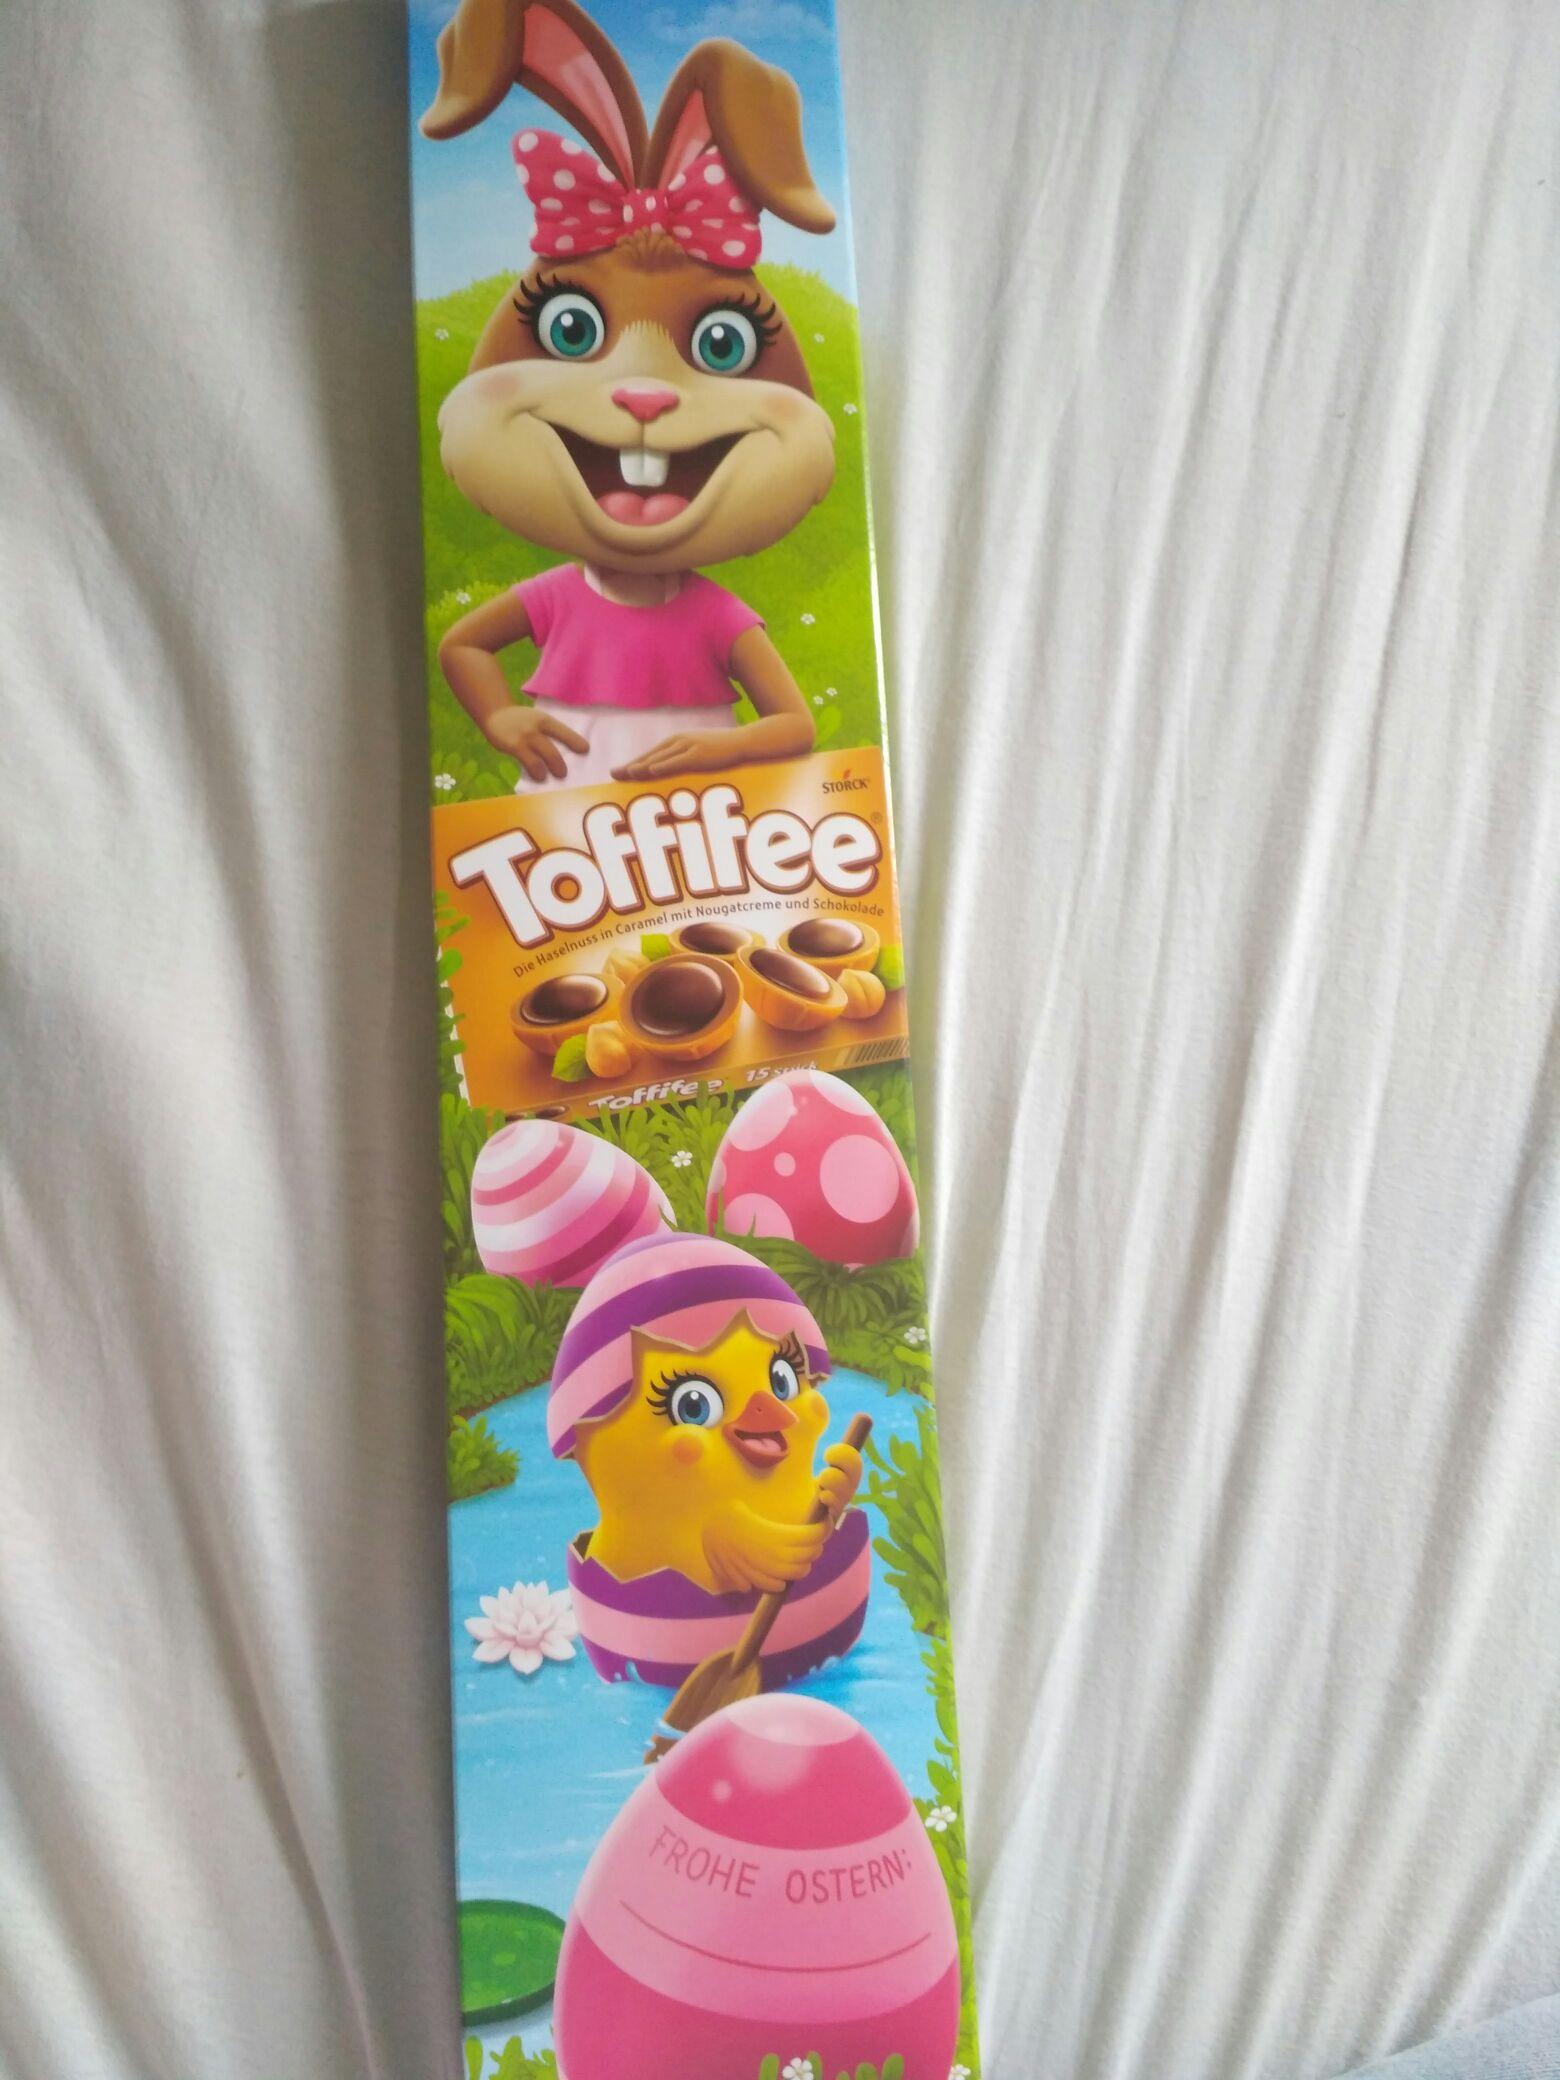 Lokal? |Toffifee Oster Edition! 0,66 € pro 125 gr Aldi|